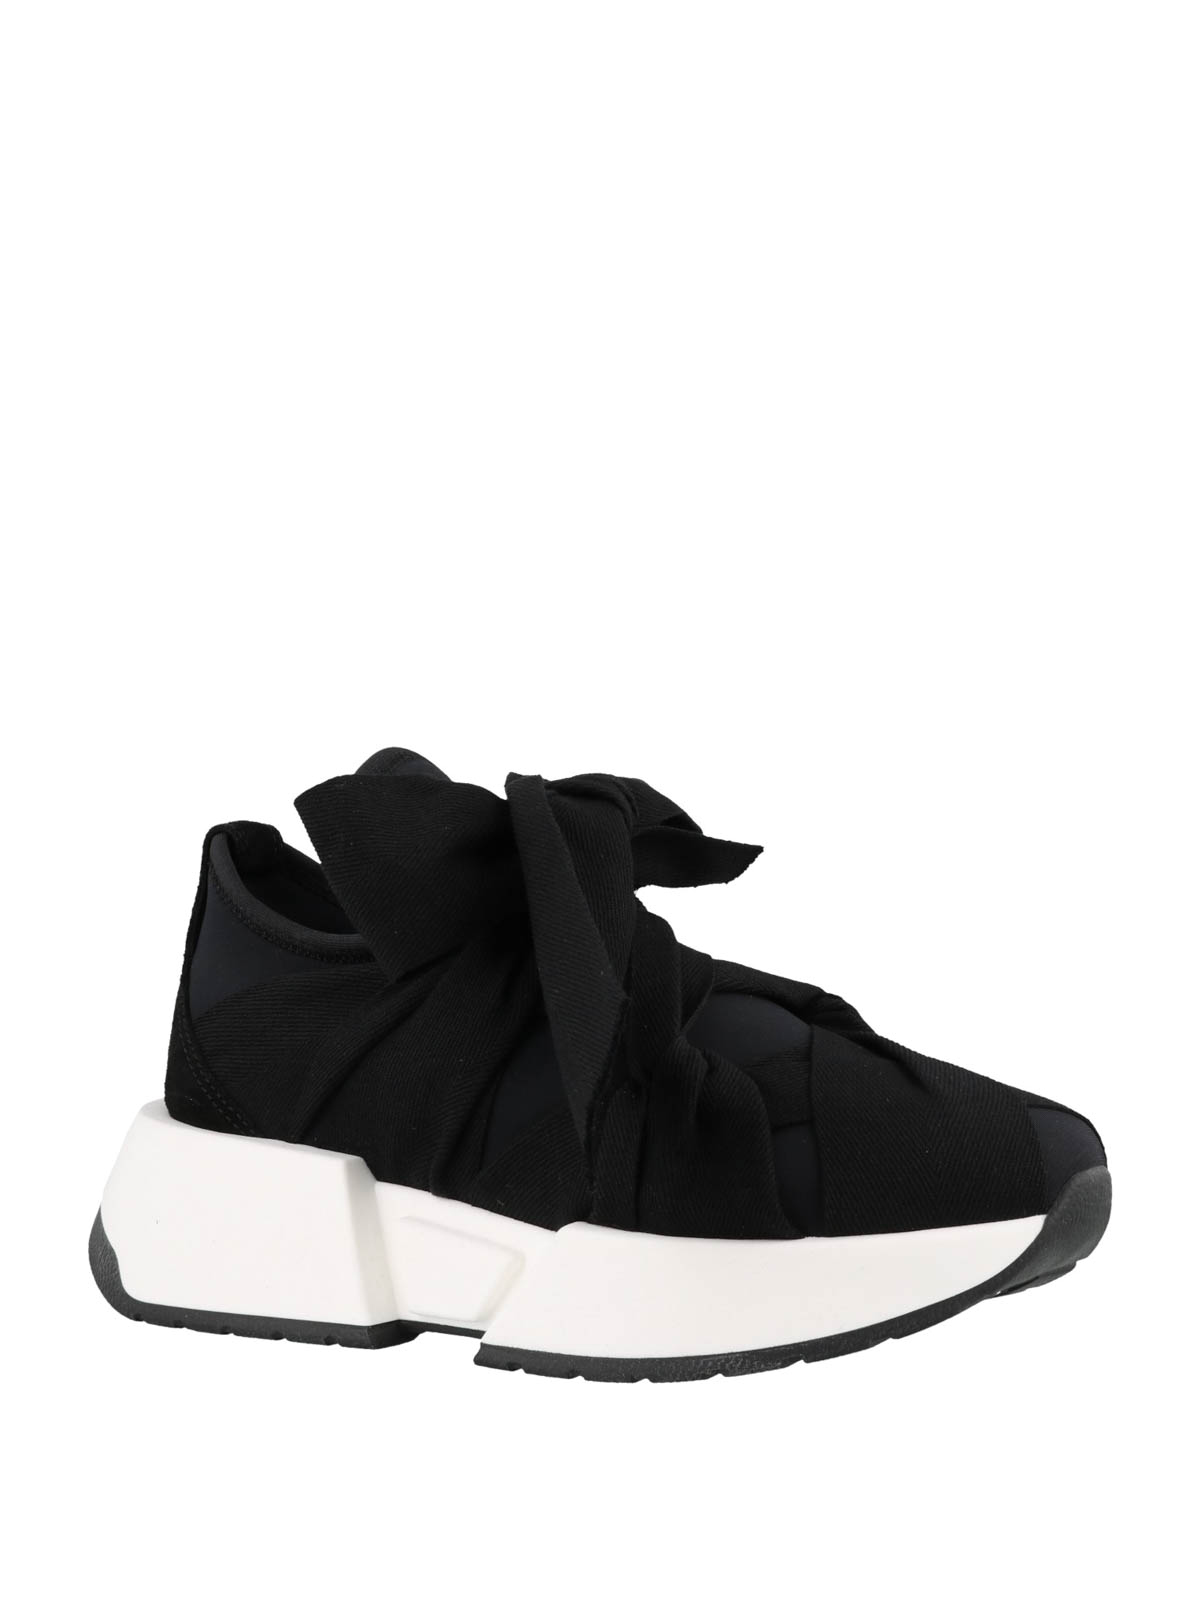 MARGIELA con Sneaker online MAISON tessuto sneakers MM6 fiocco in w5axqzS